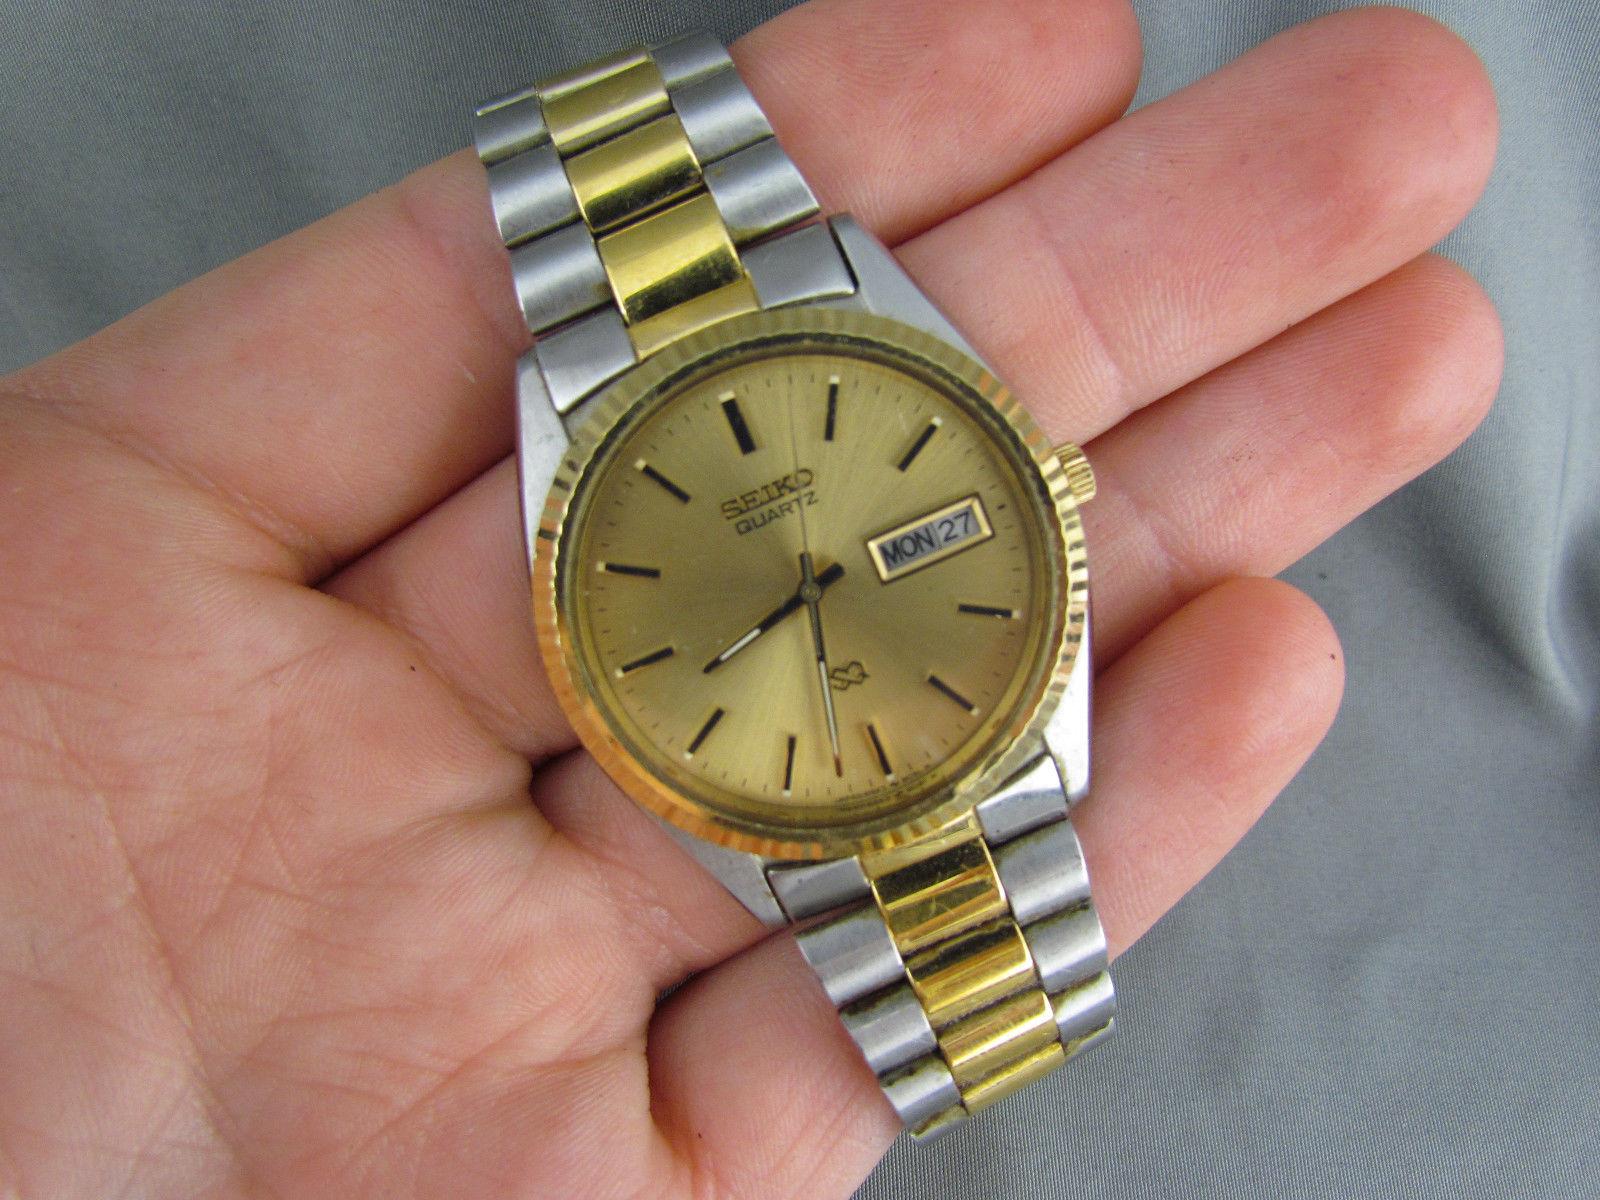 vintage-seiko-sq-quartz-6923-8080-watch-private-sale-for-saintjamessmythe-only-884470ced568573ddd20313ecb5c8801.jpg